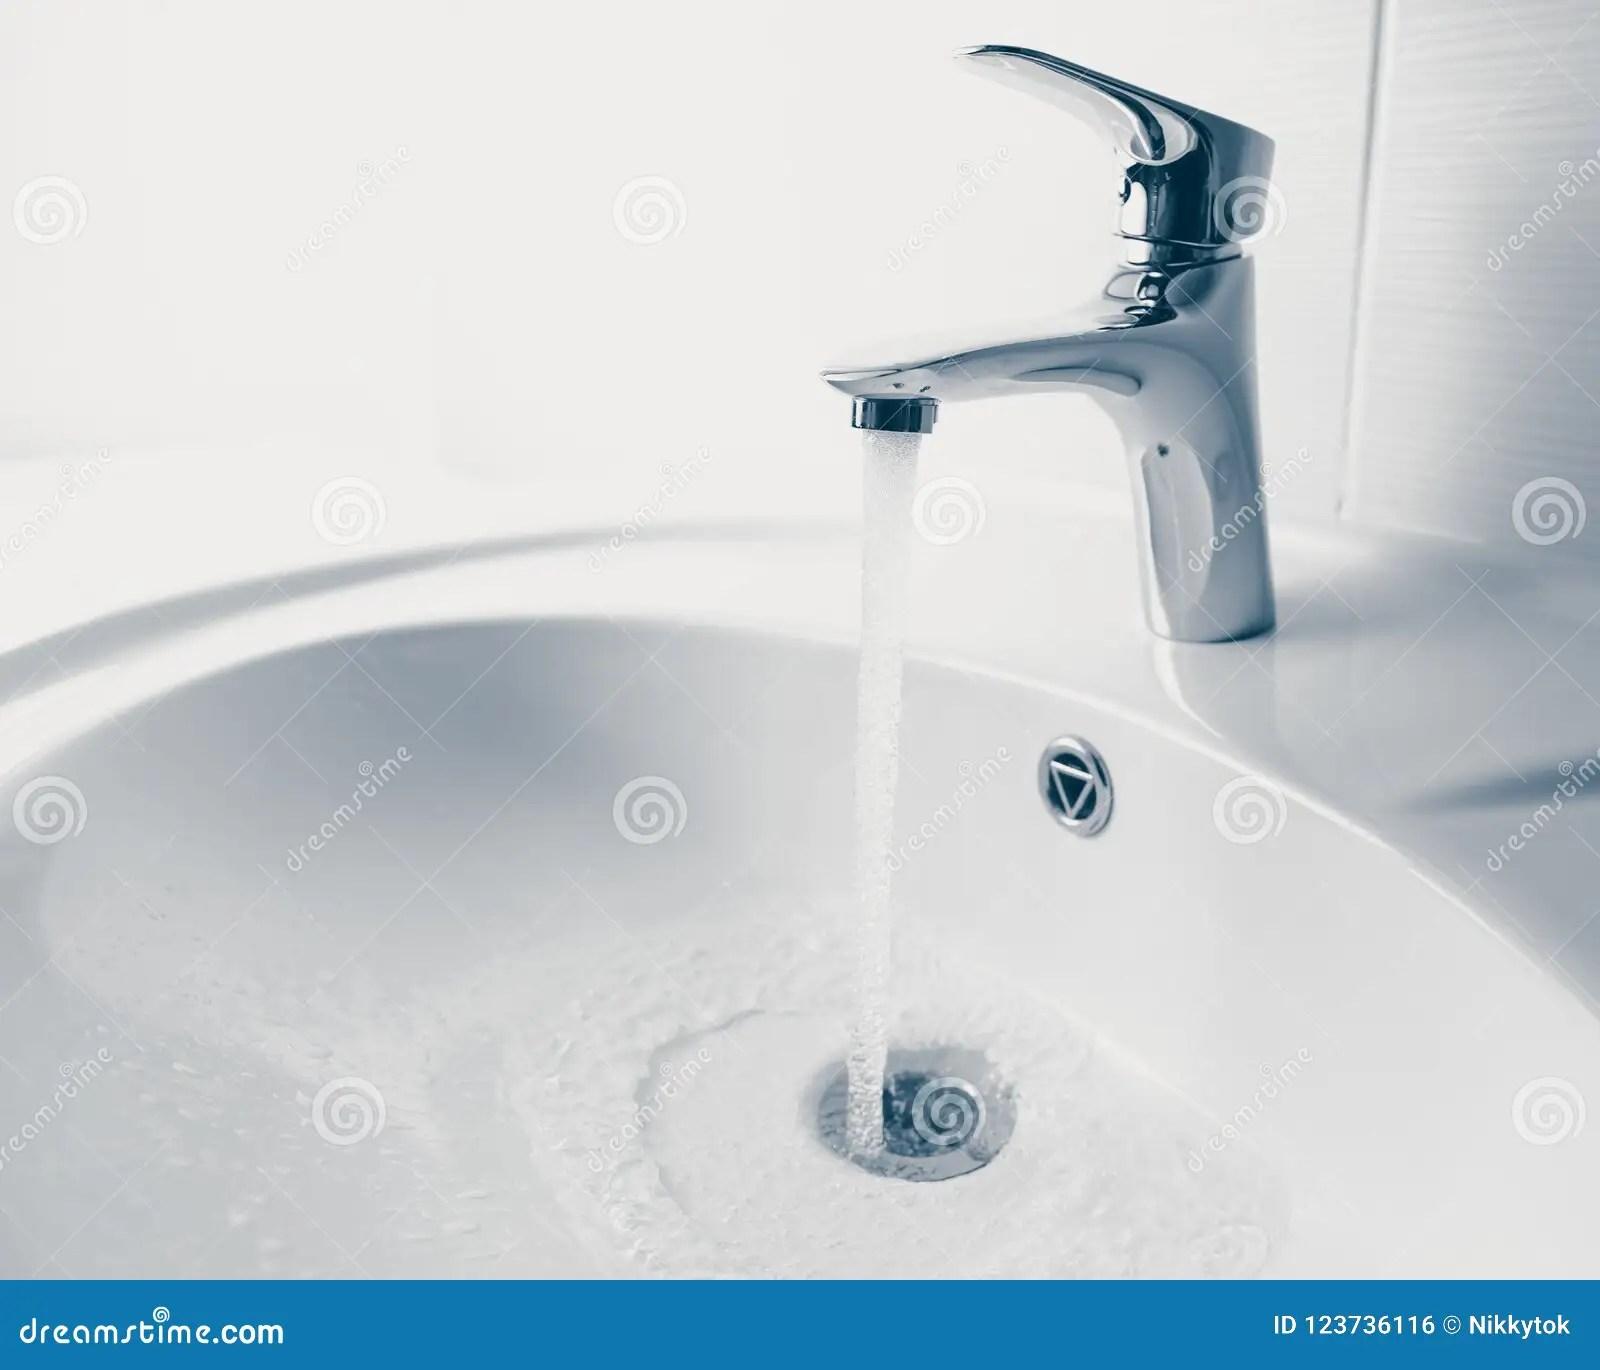 https www dreamstime com faucet wash sink flowing water faucet wash sink flowing water close up view image123736116